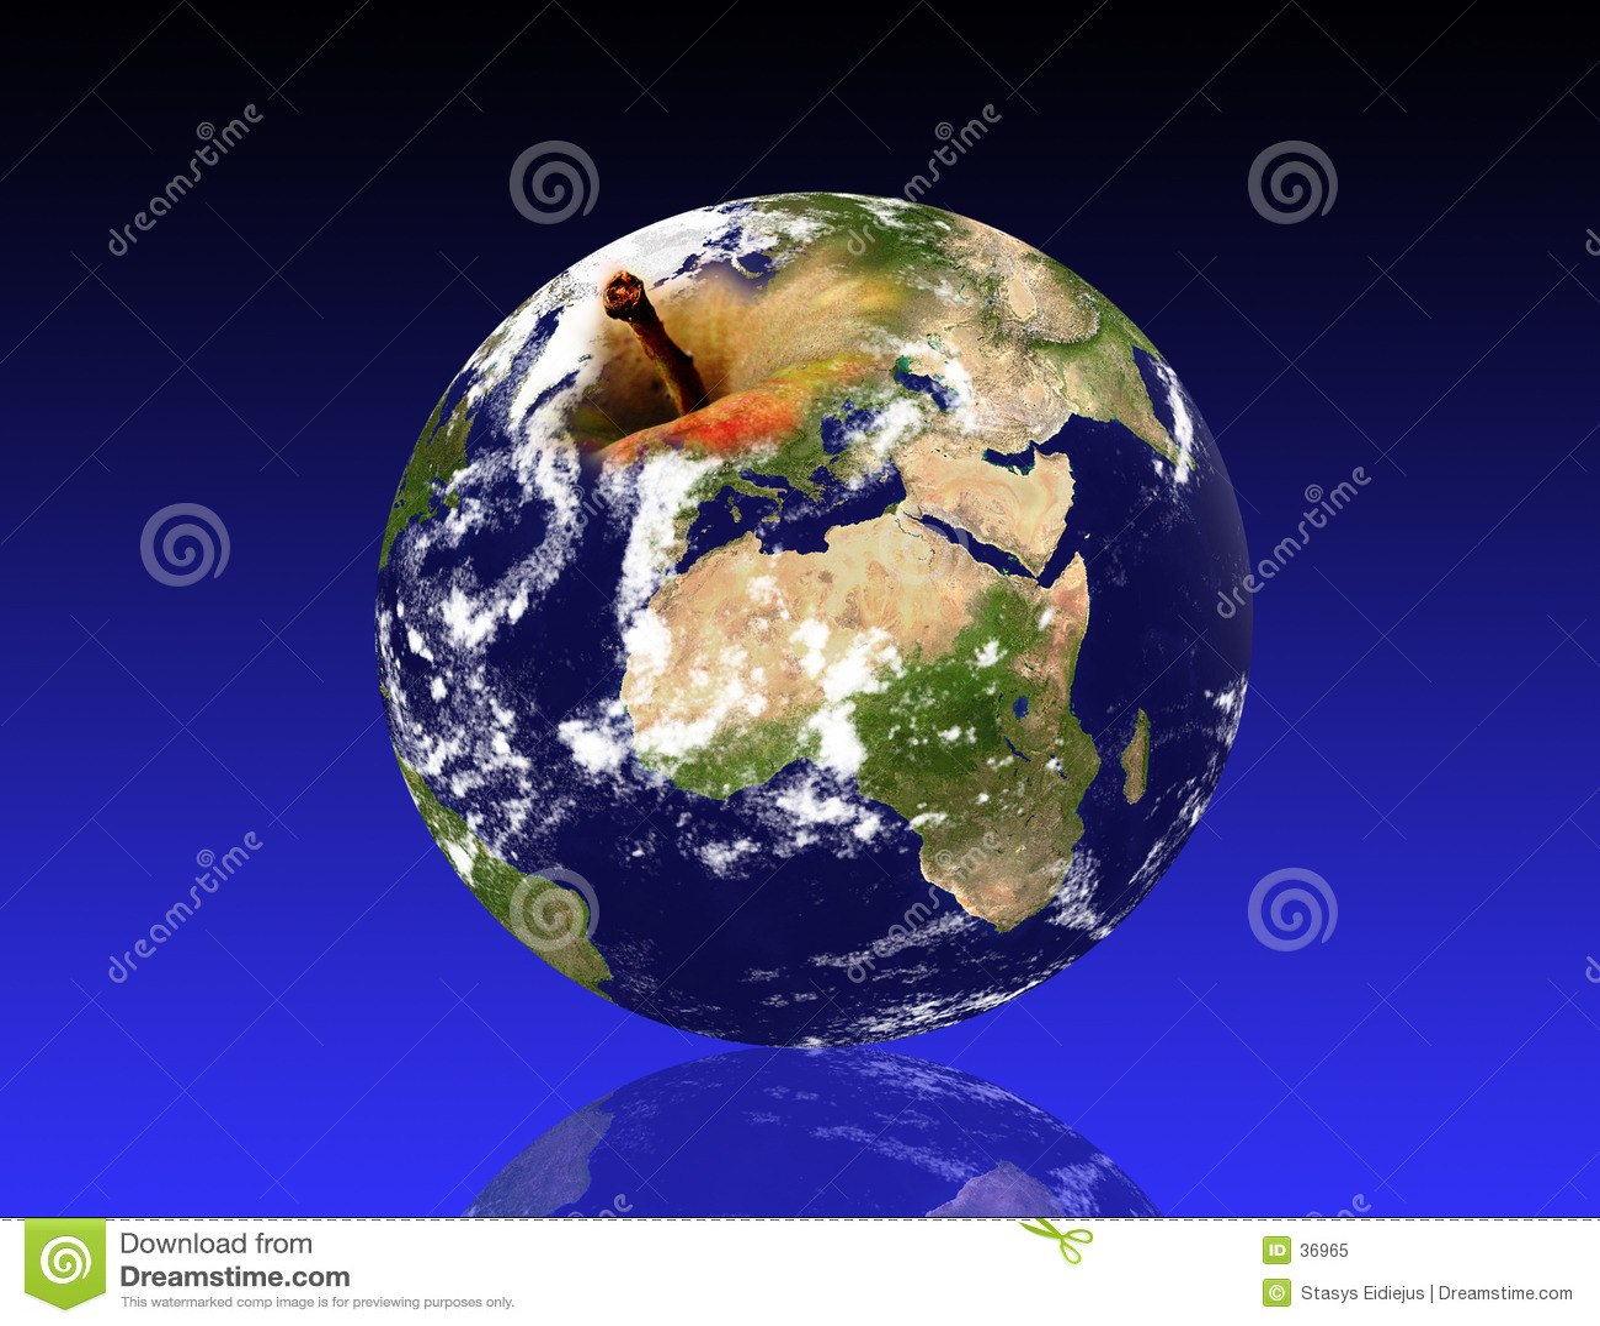 Earth planet, like an apple